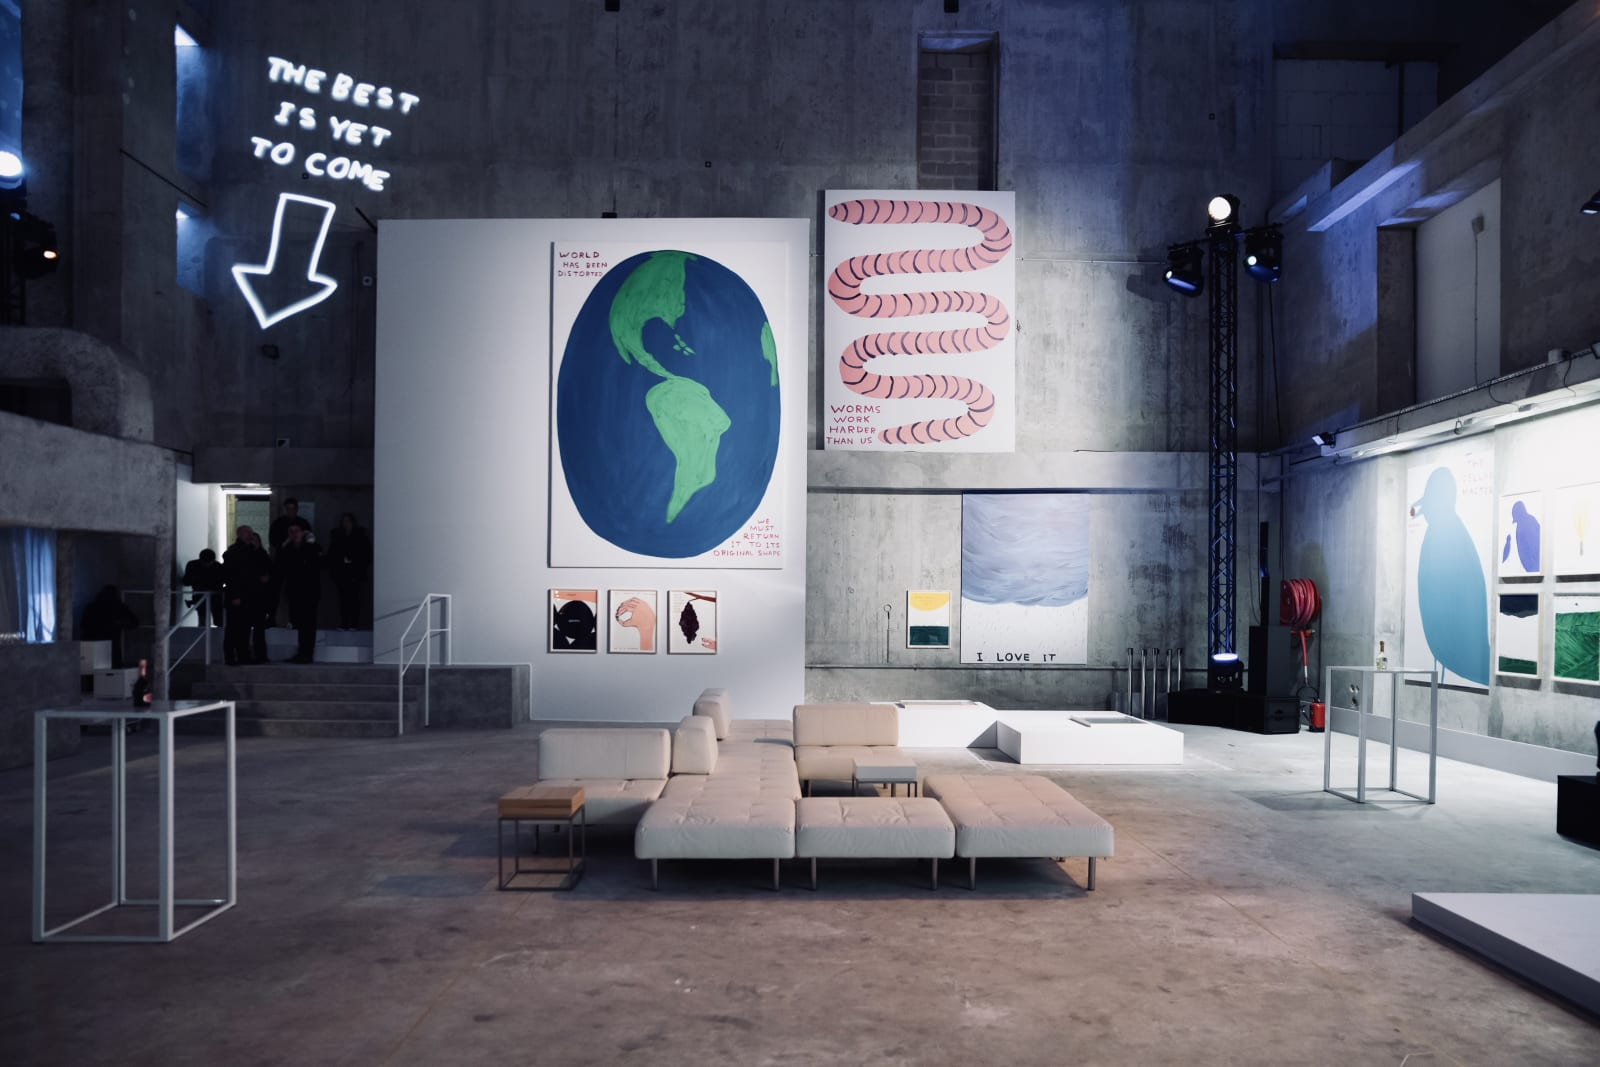 <p>Opening event, 'Unconventional Bubbles: An artistic reinterpretation of Maison Ruinart by British artist David Shrigley', Paris (2020).</p>